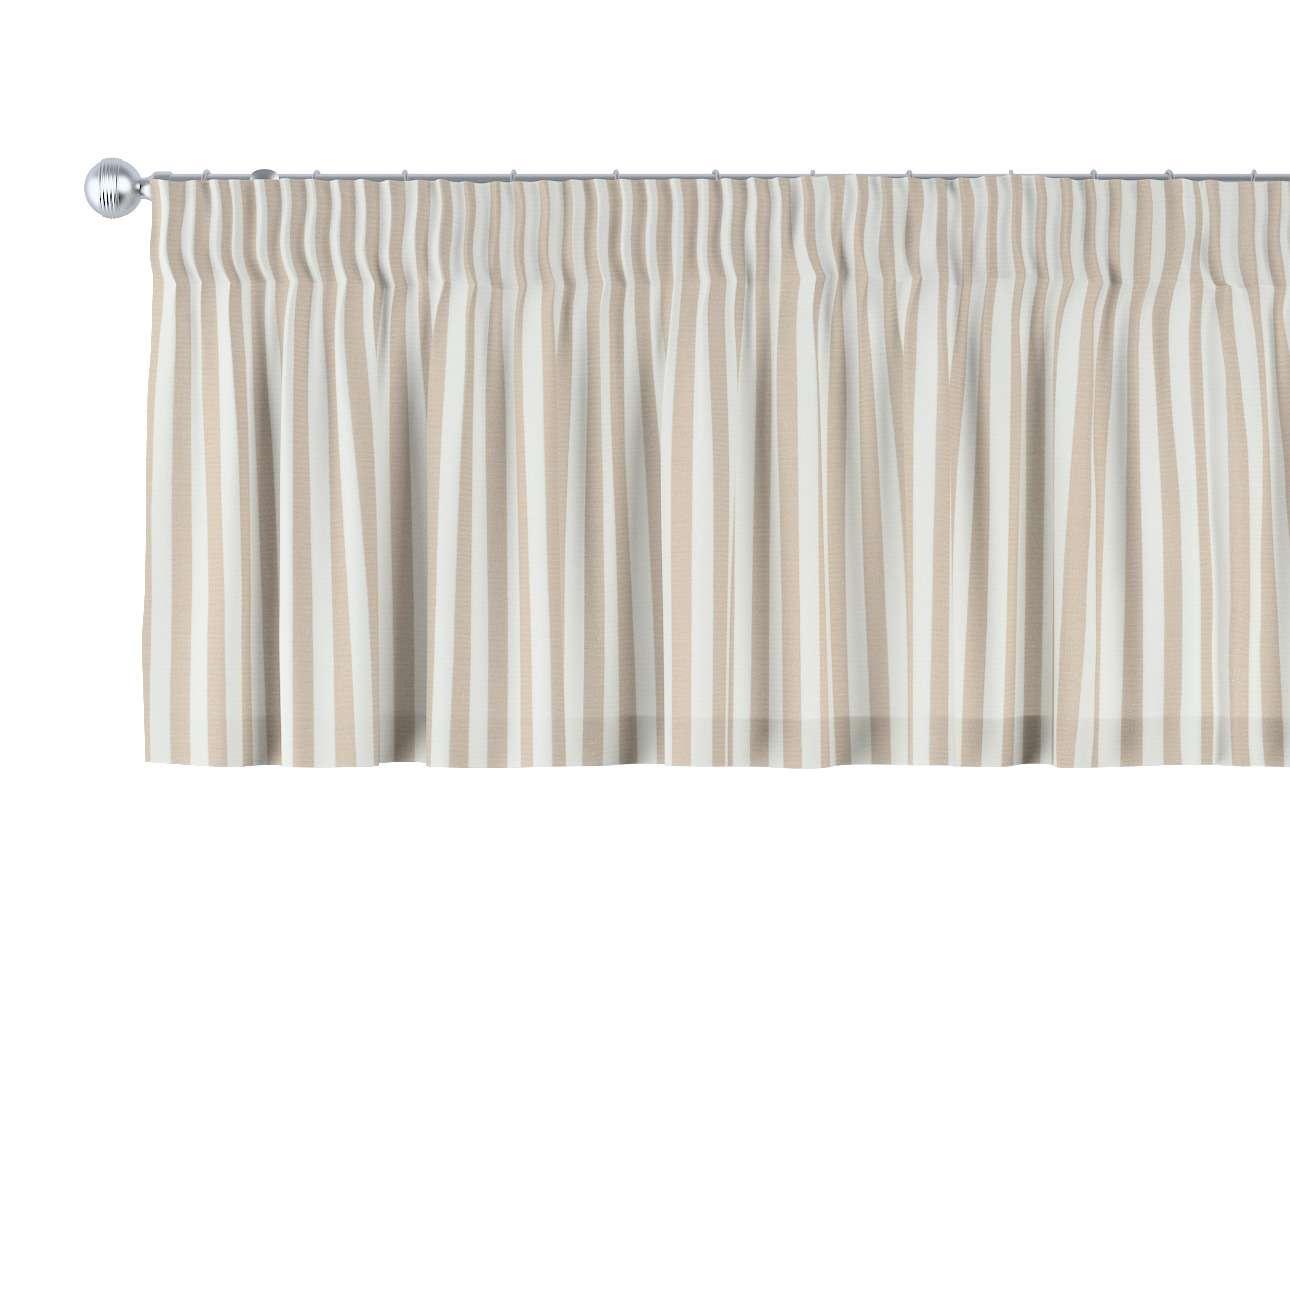 Kurzgardine mit Kräuselband 130 x 40 cm von der Kollektion Quadro, Stoff: 136-07